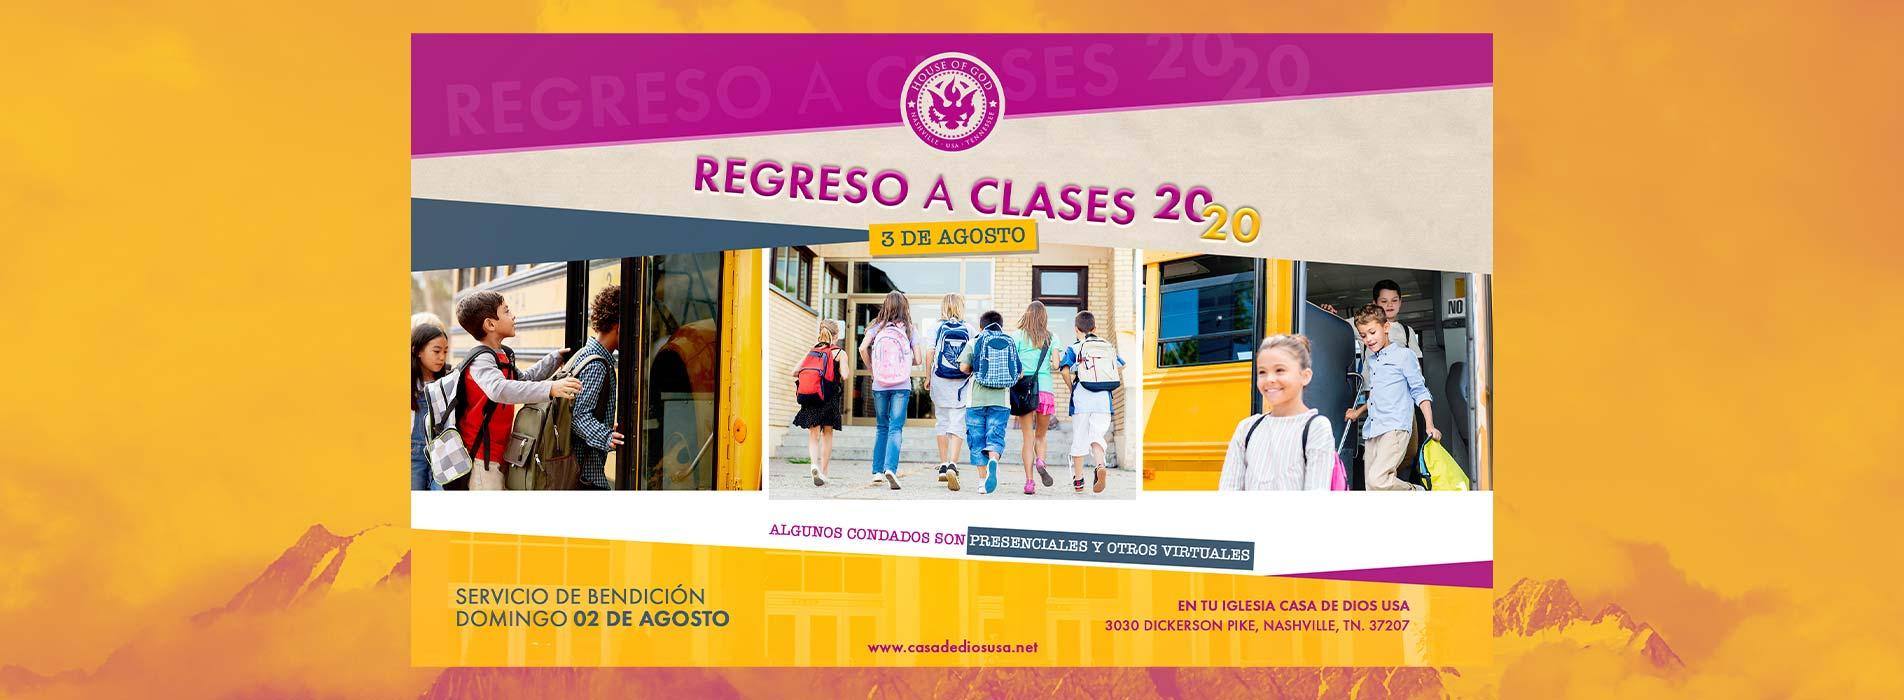 Slider-Regreso-a-Clases-2020